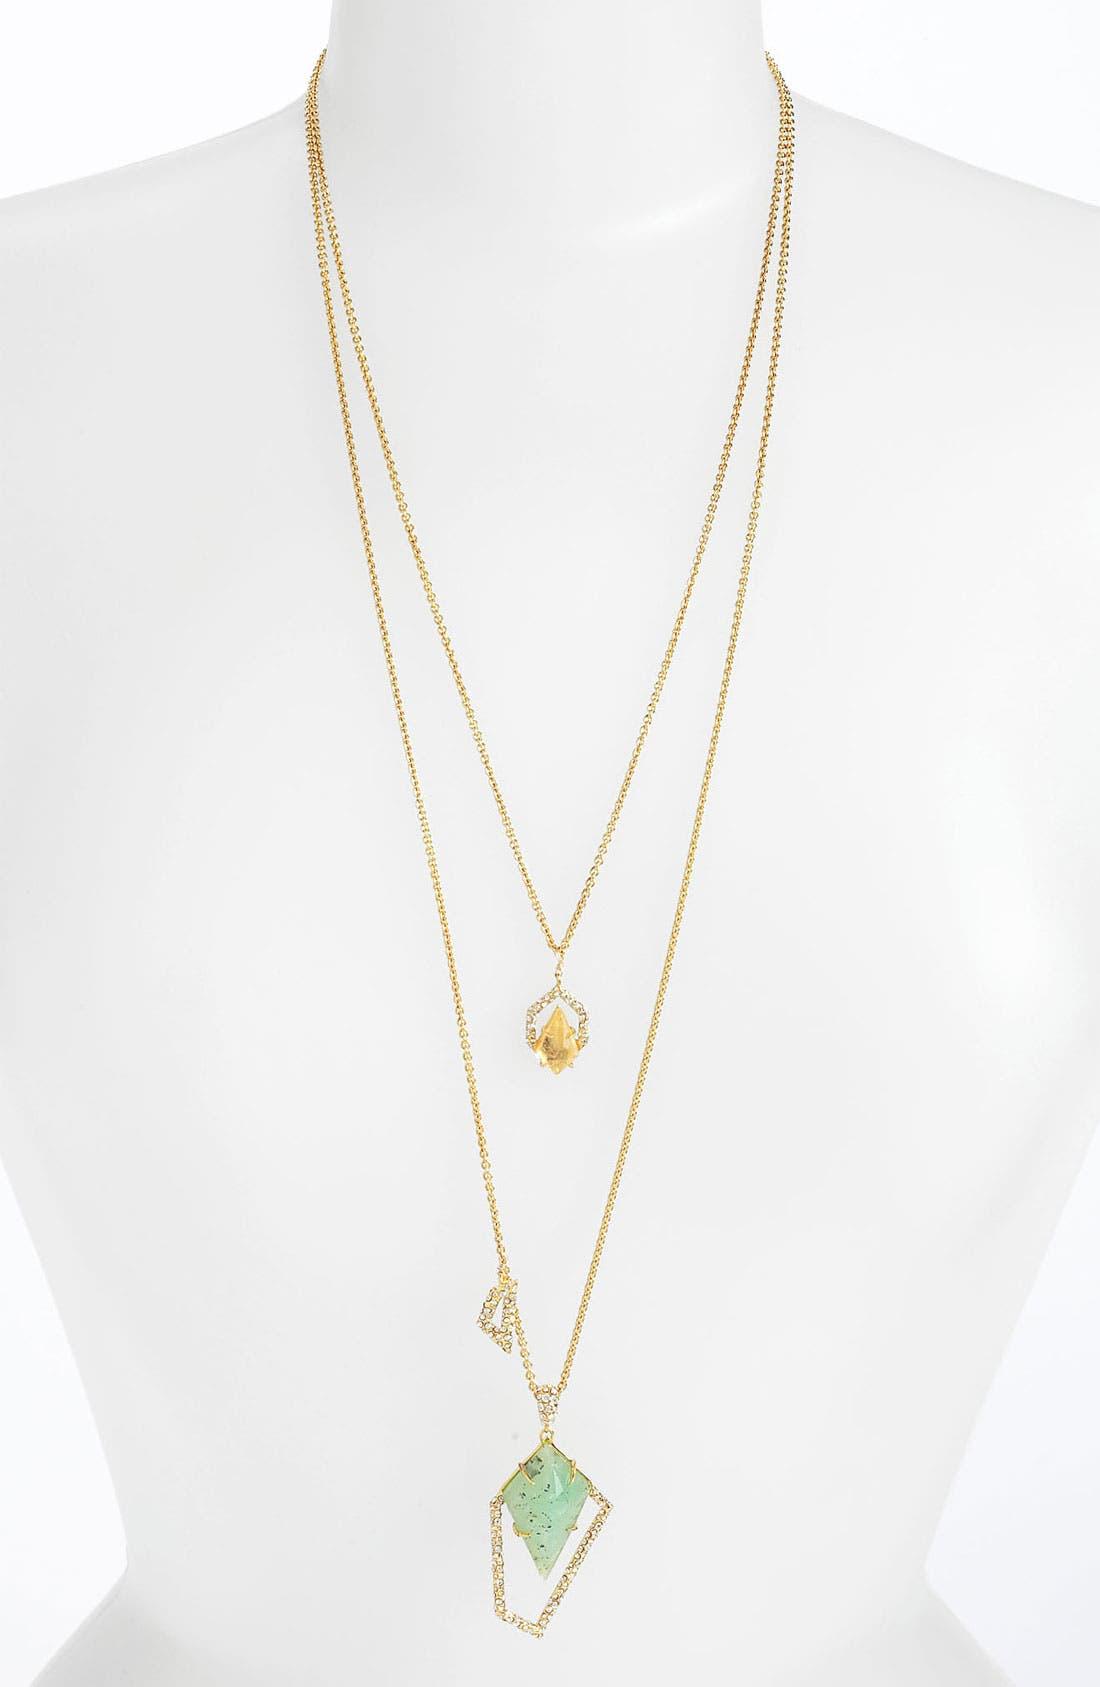 Alternate Image 1 Selected - Alexis Bittar 'Miss Havisham - New Wave' Layered Necklace (Nordstrom Exclusive)